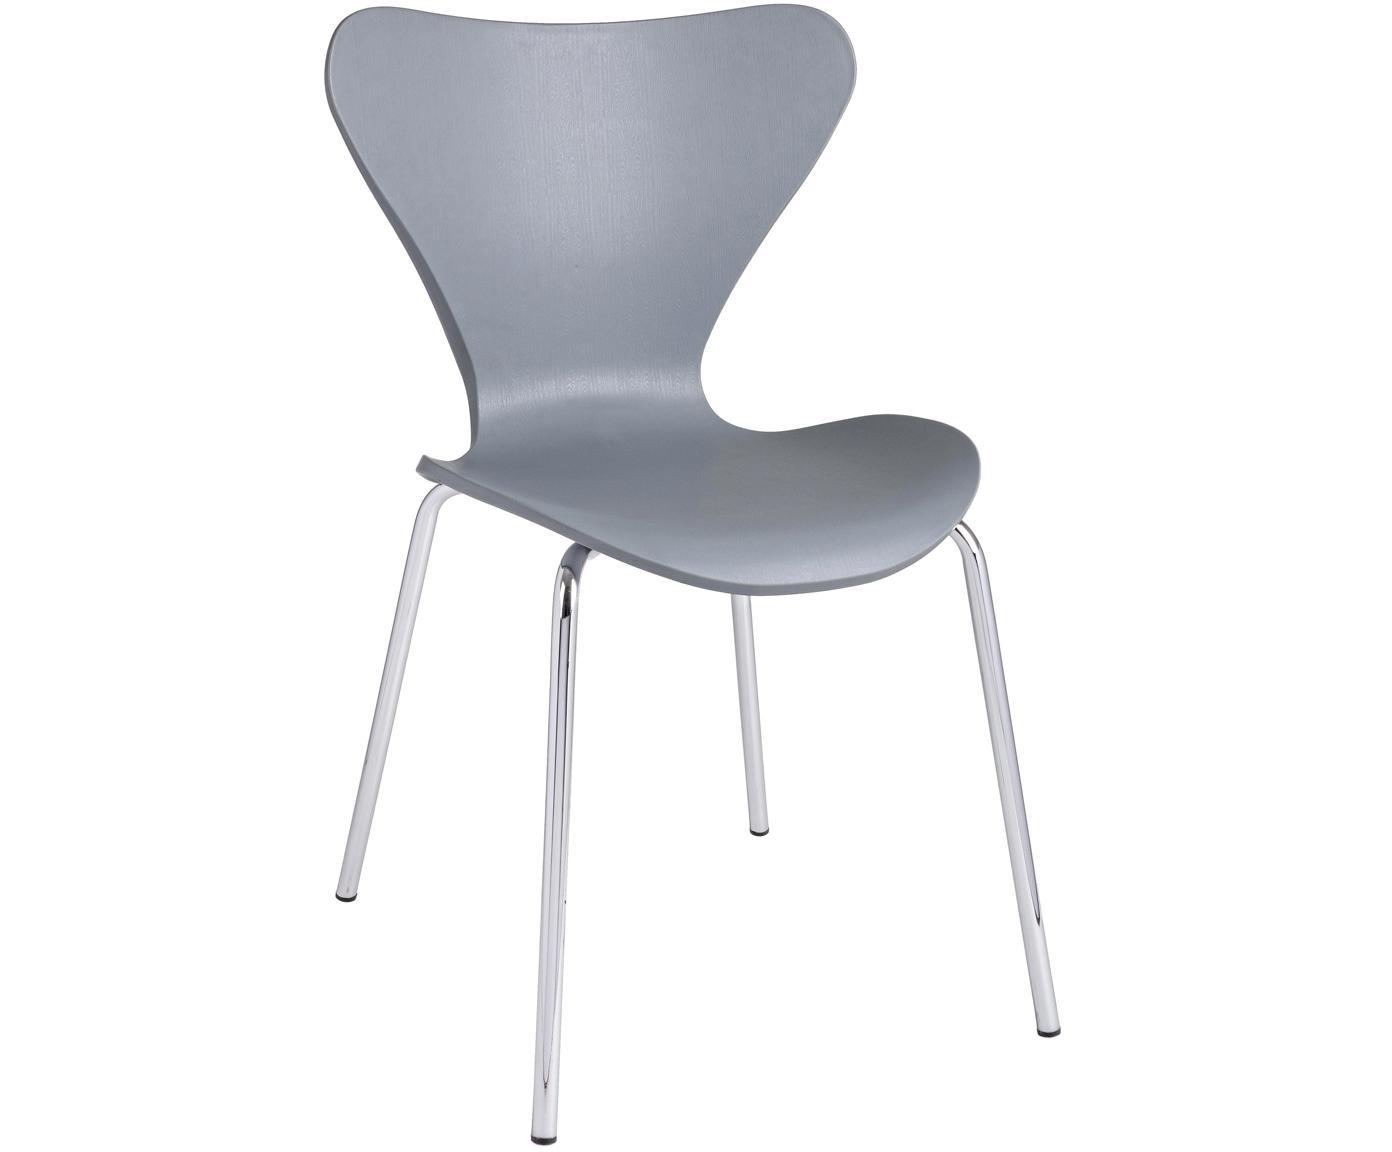 Sedia impilabile in plastica Tessa, 2 pz., Seduta: materiale sintetico (poli, Gambe: metallo cromato, Grigio chiaro, cromo, Larg. 50 x Prof. 50 cm